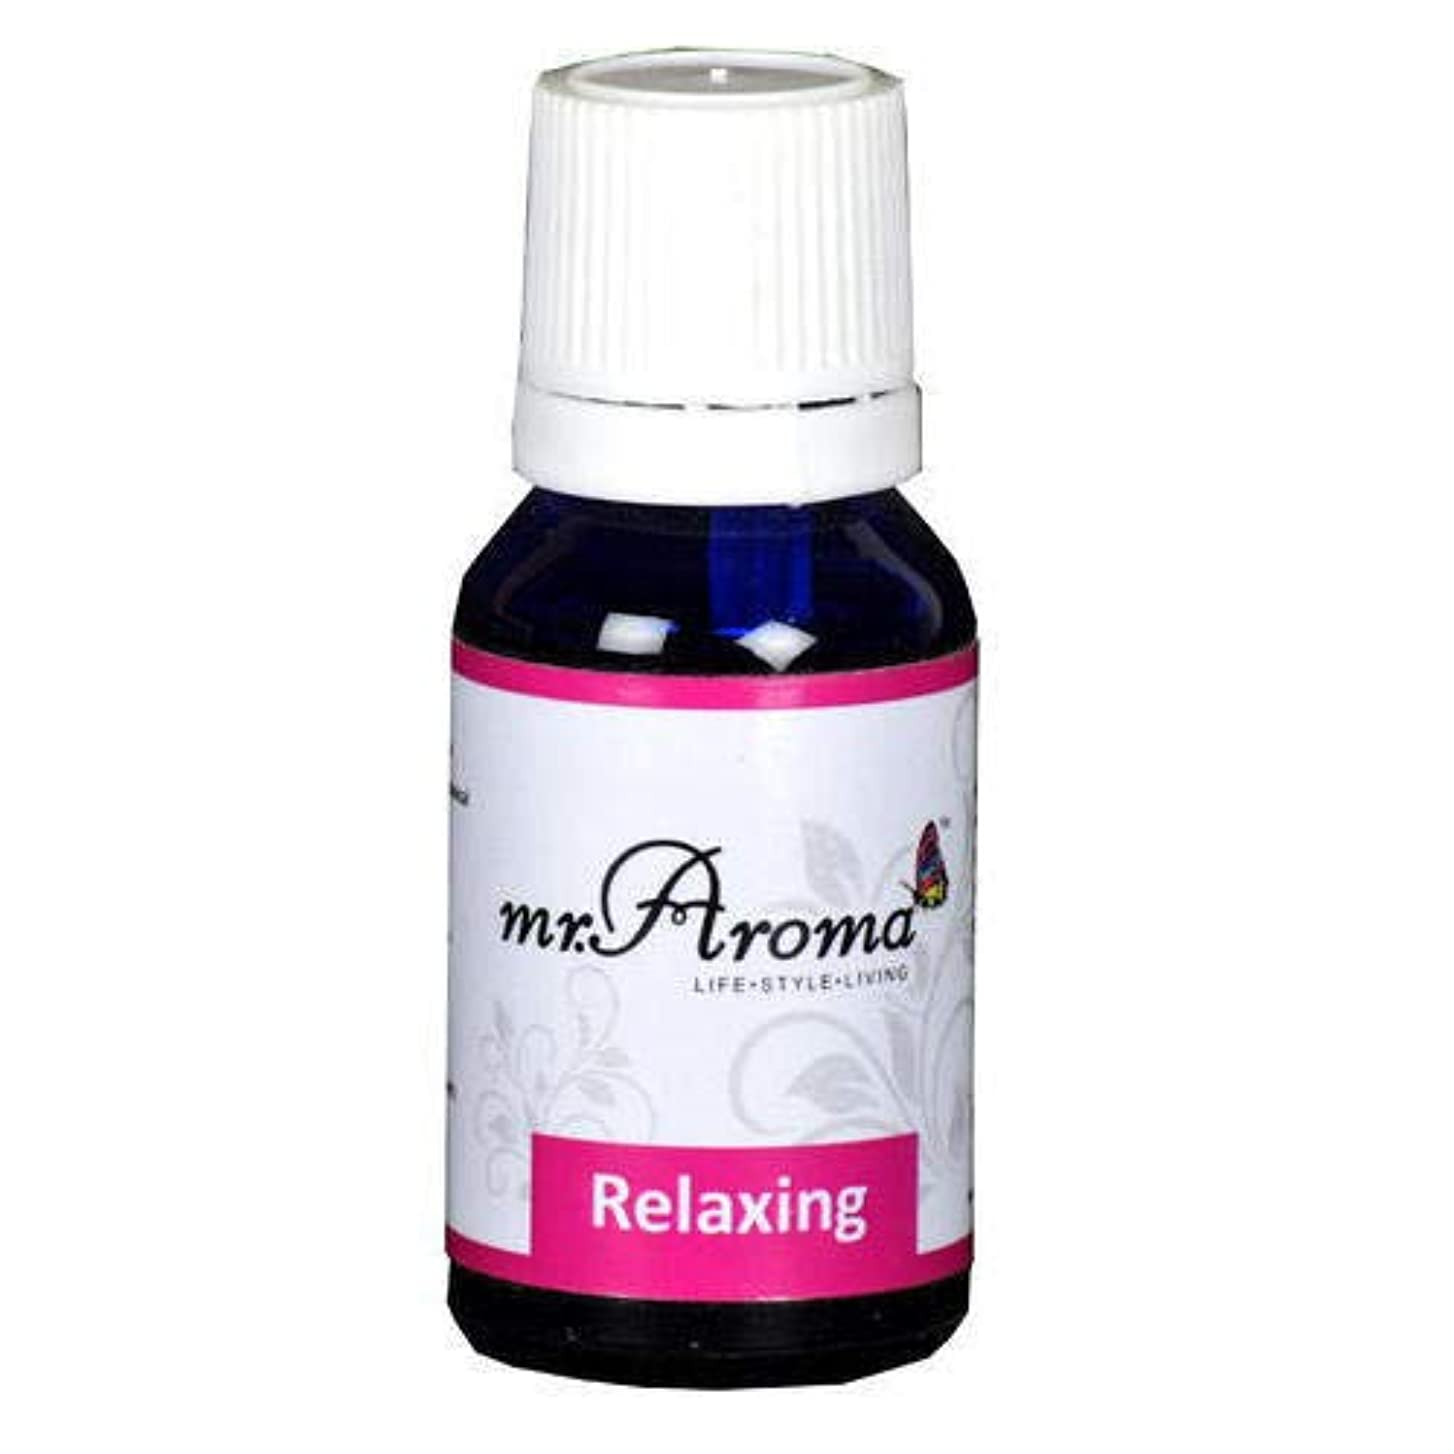 夜明け代数聴覚障害者Mr. Aroma Relaxing Vaporizer/Essential Oil